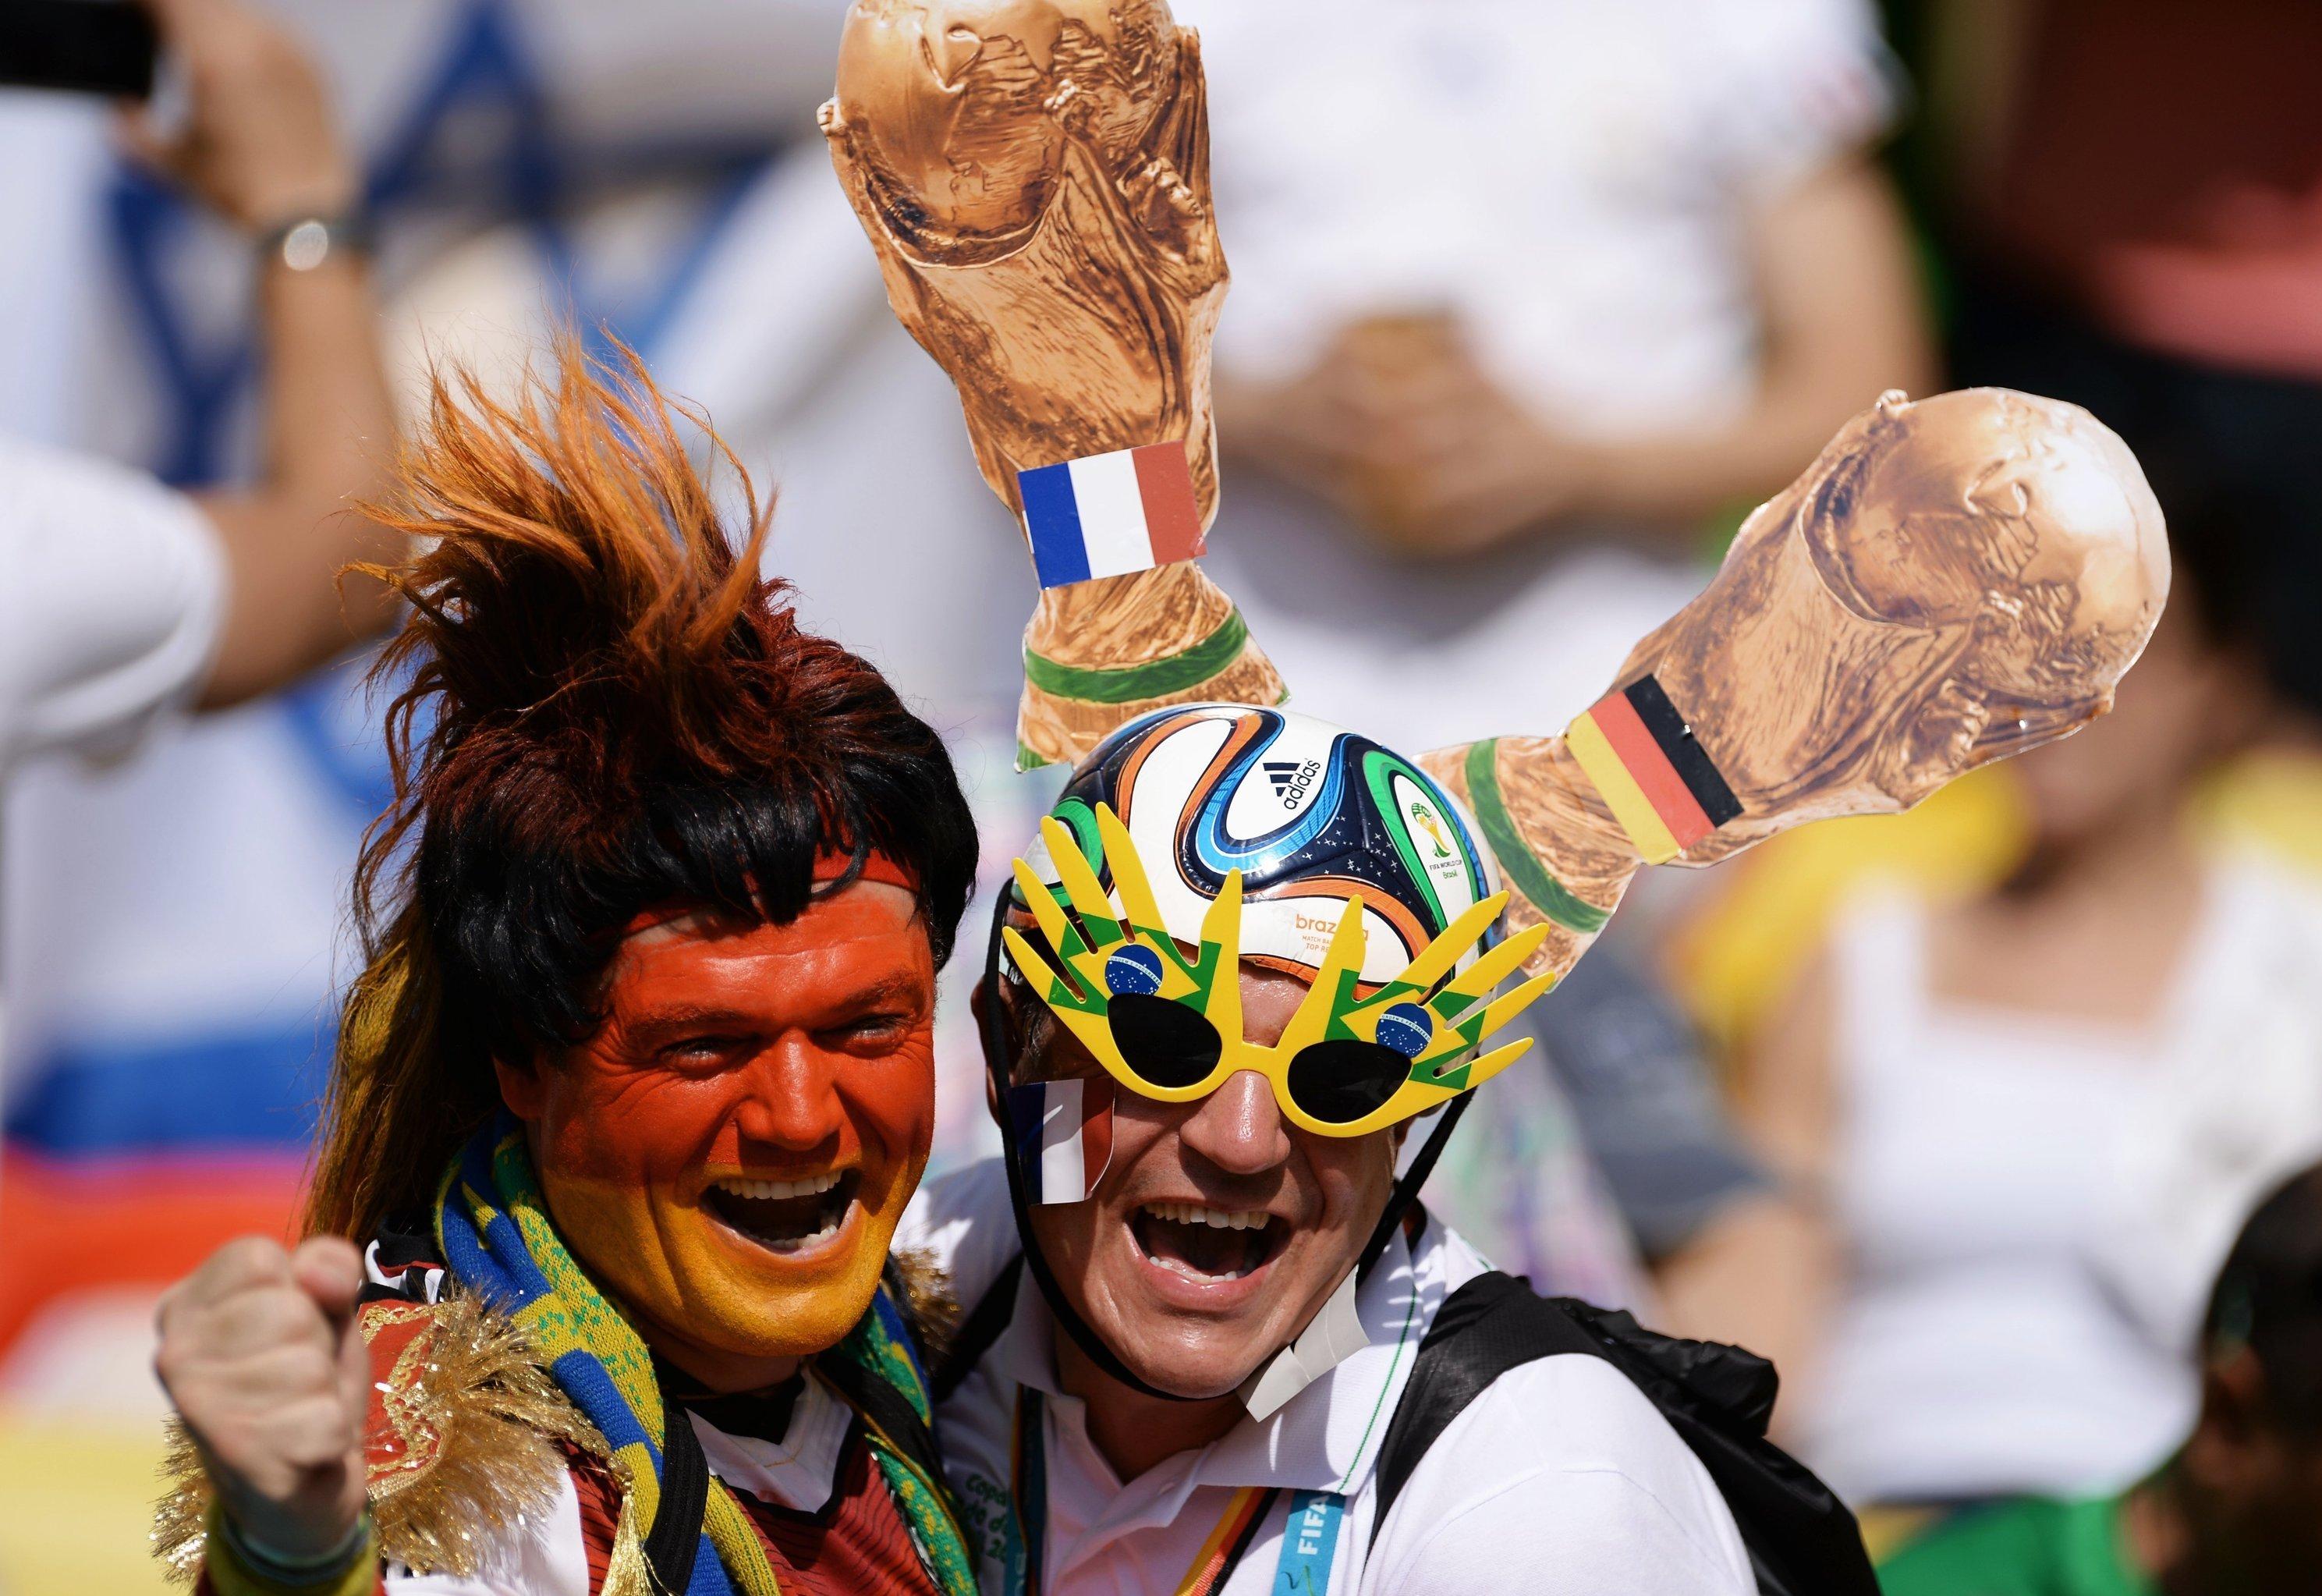 Mondial 2014, match France-Allemagne